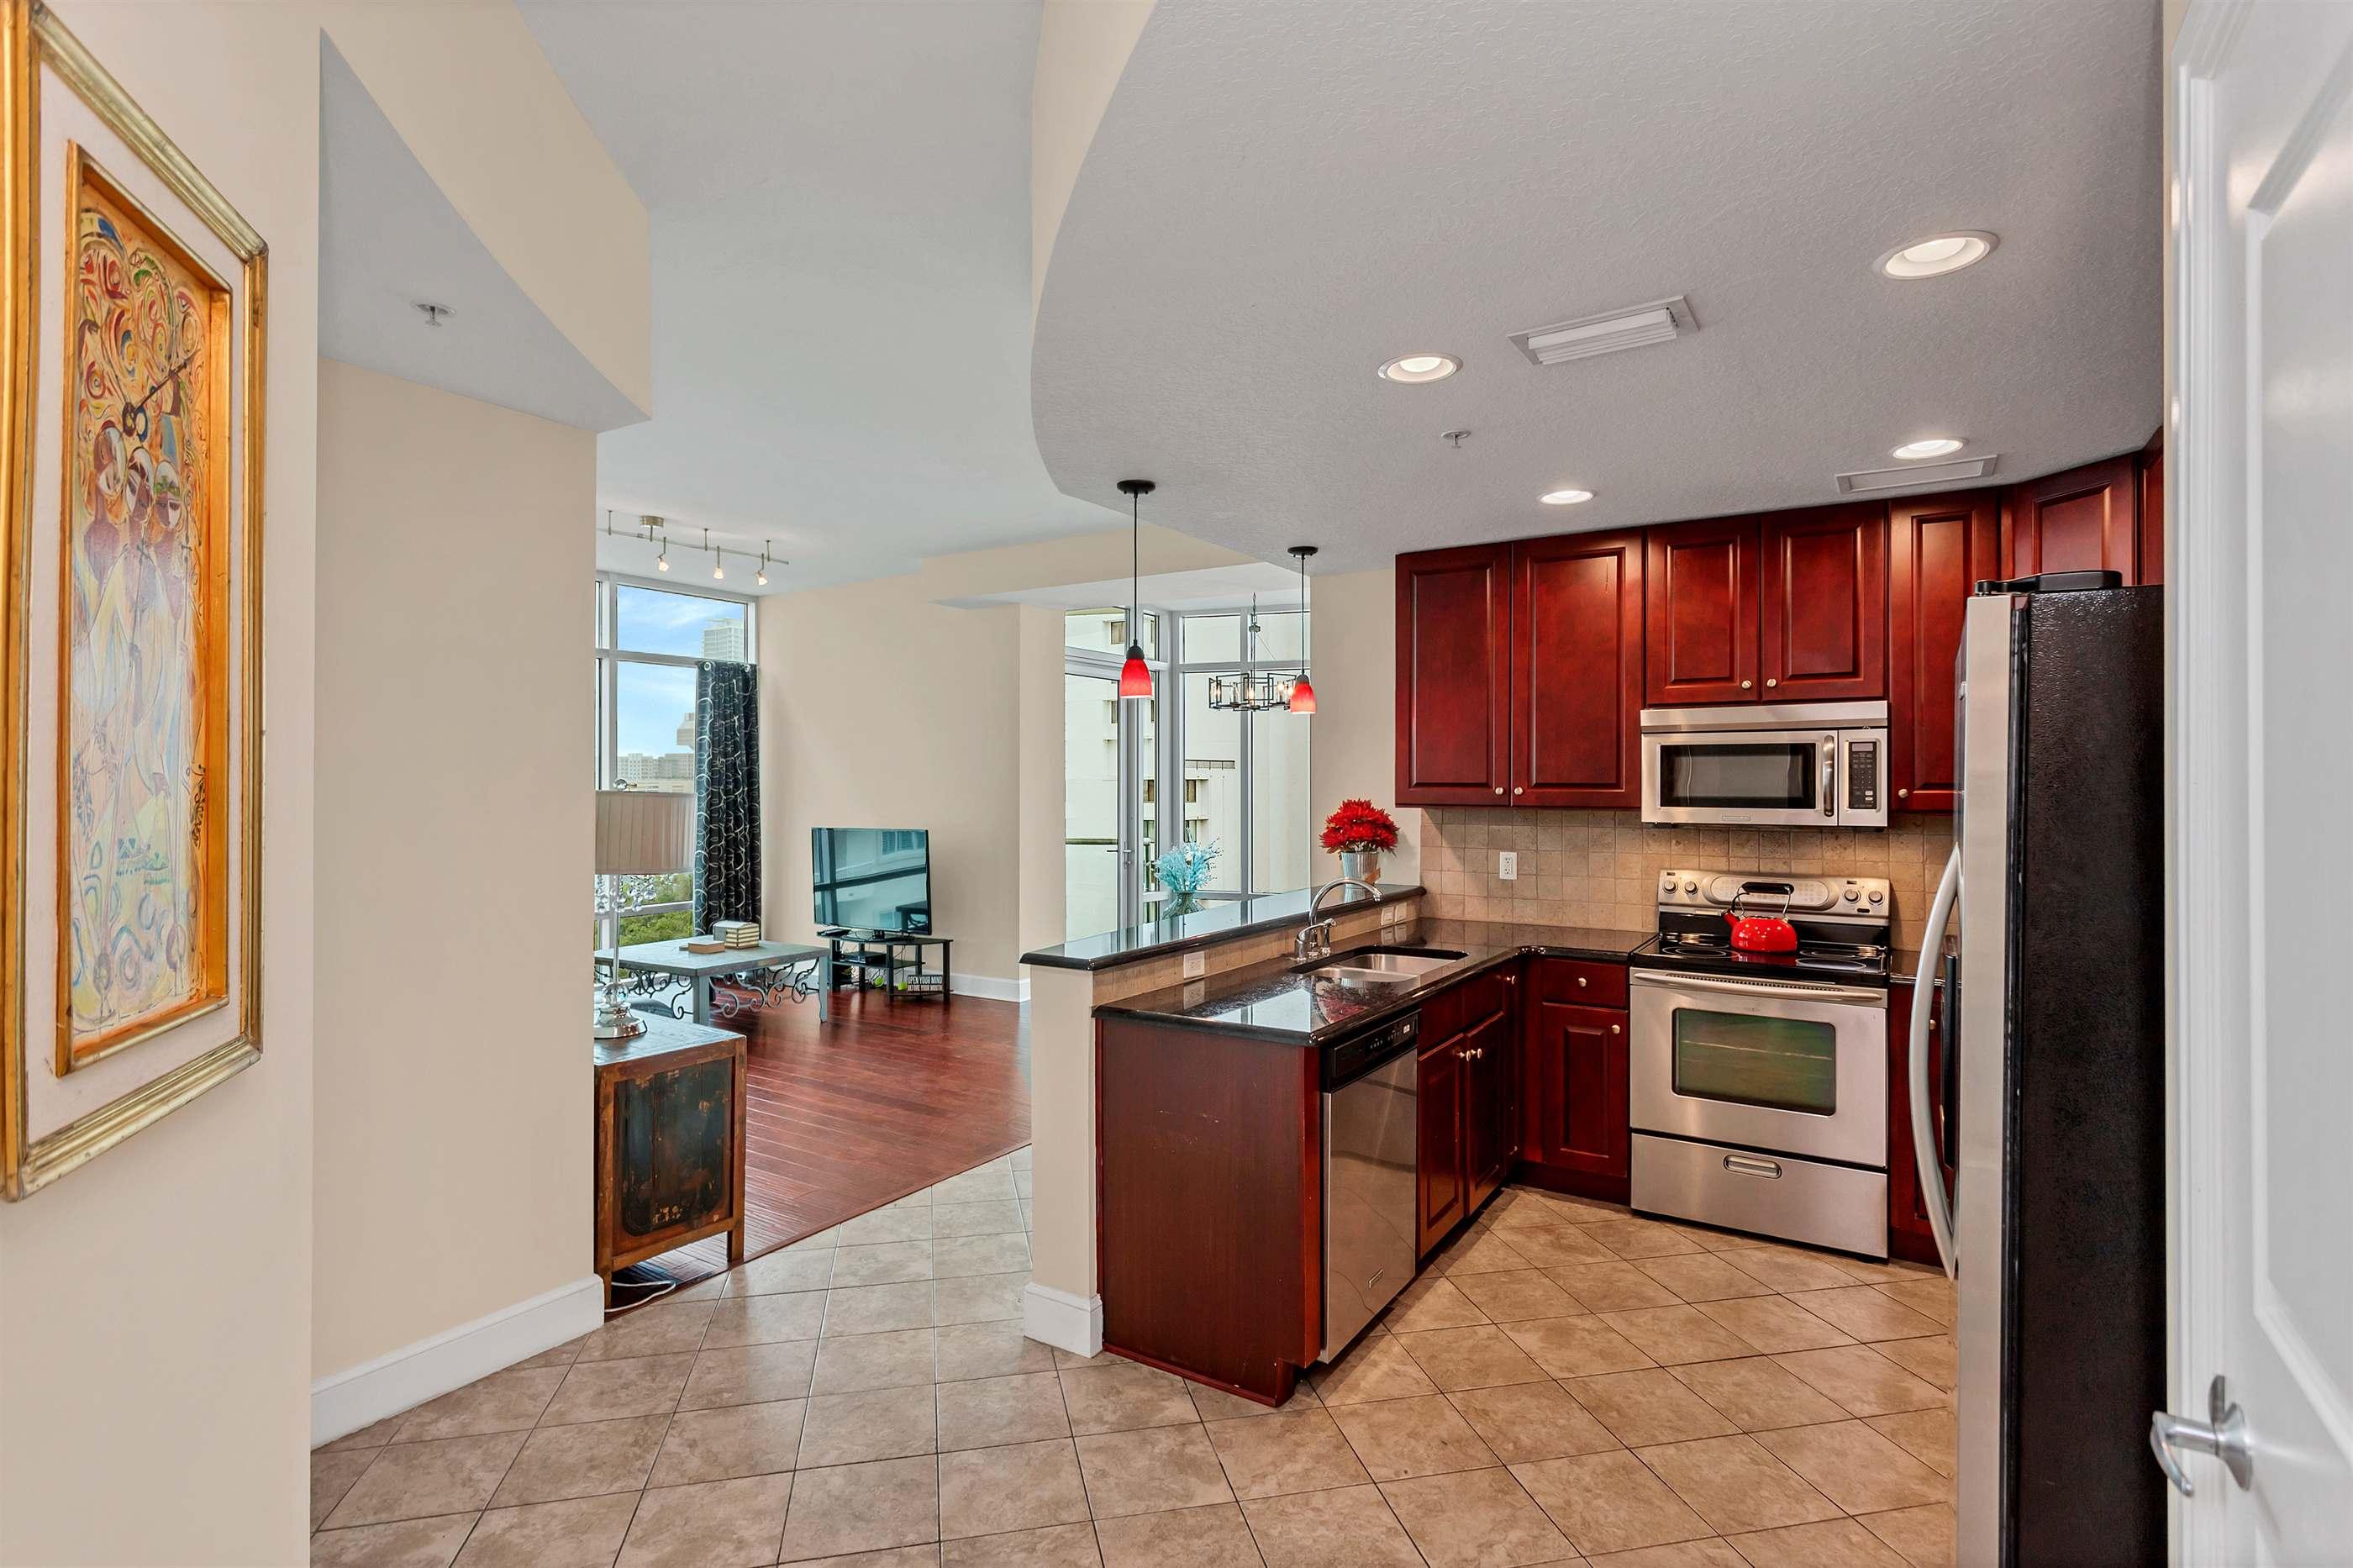 101 South Eola Drive, ORLANDO, Florida 32801, 2 Bedrooms Bedrooms, ,2 BathroomsBathrooms,Condominium,For Sale,101 South Eola Drive,O5936608